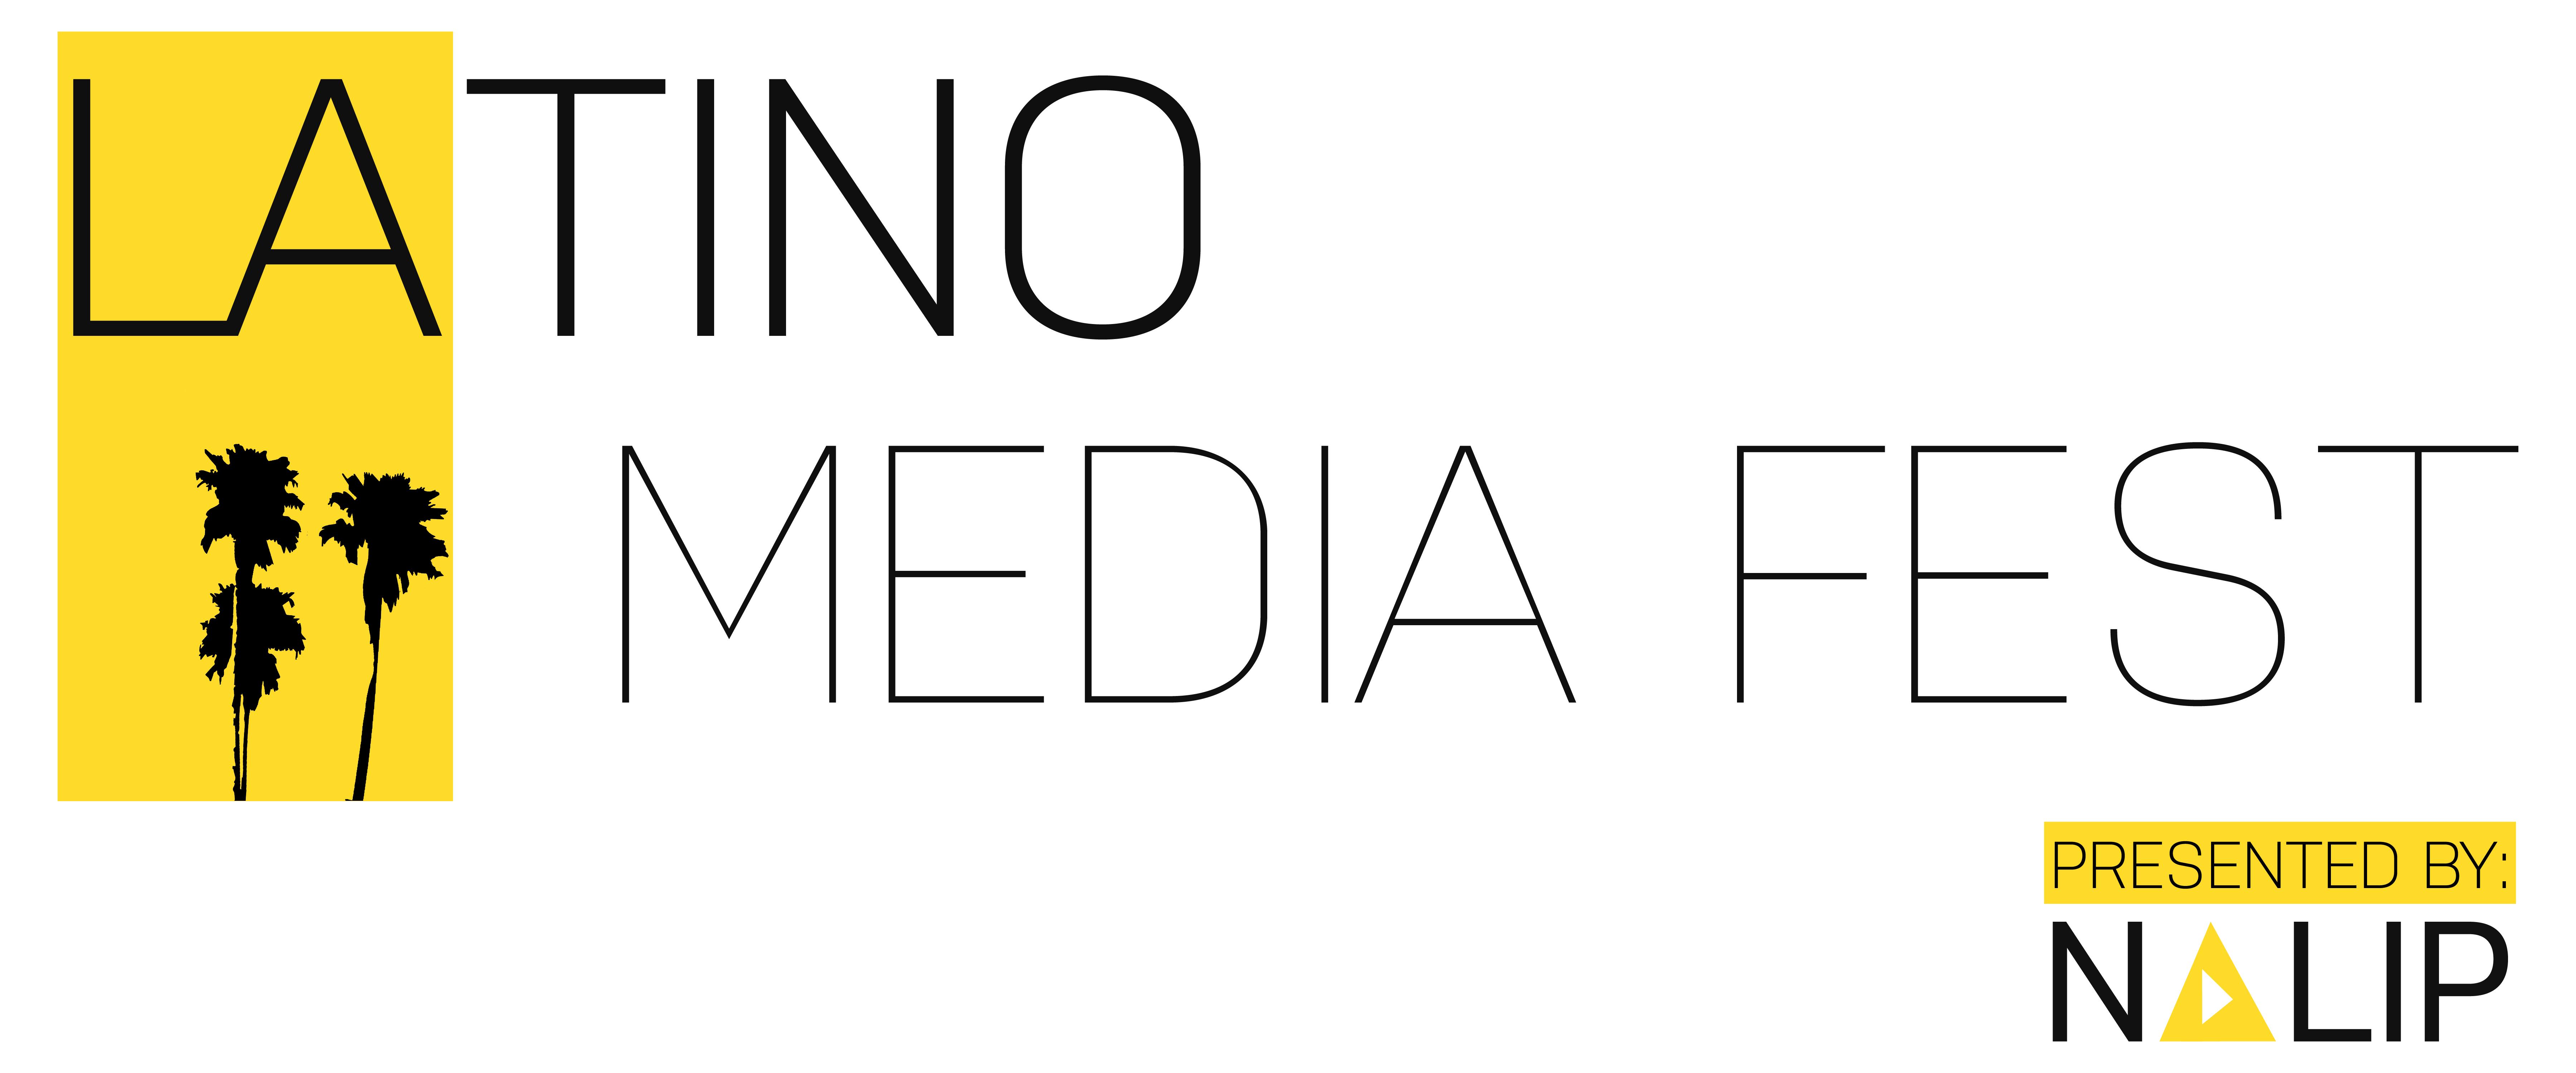 LMF_2017_Logo_01.png